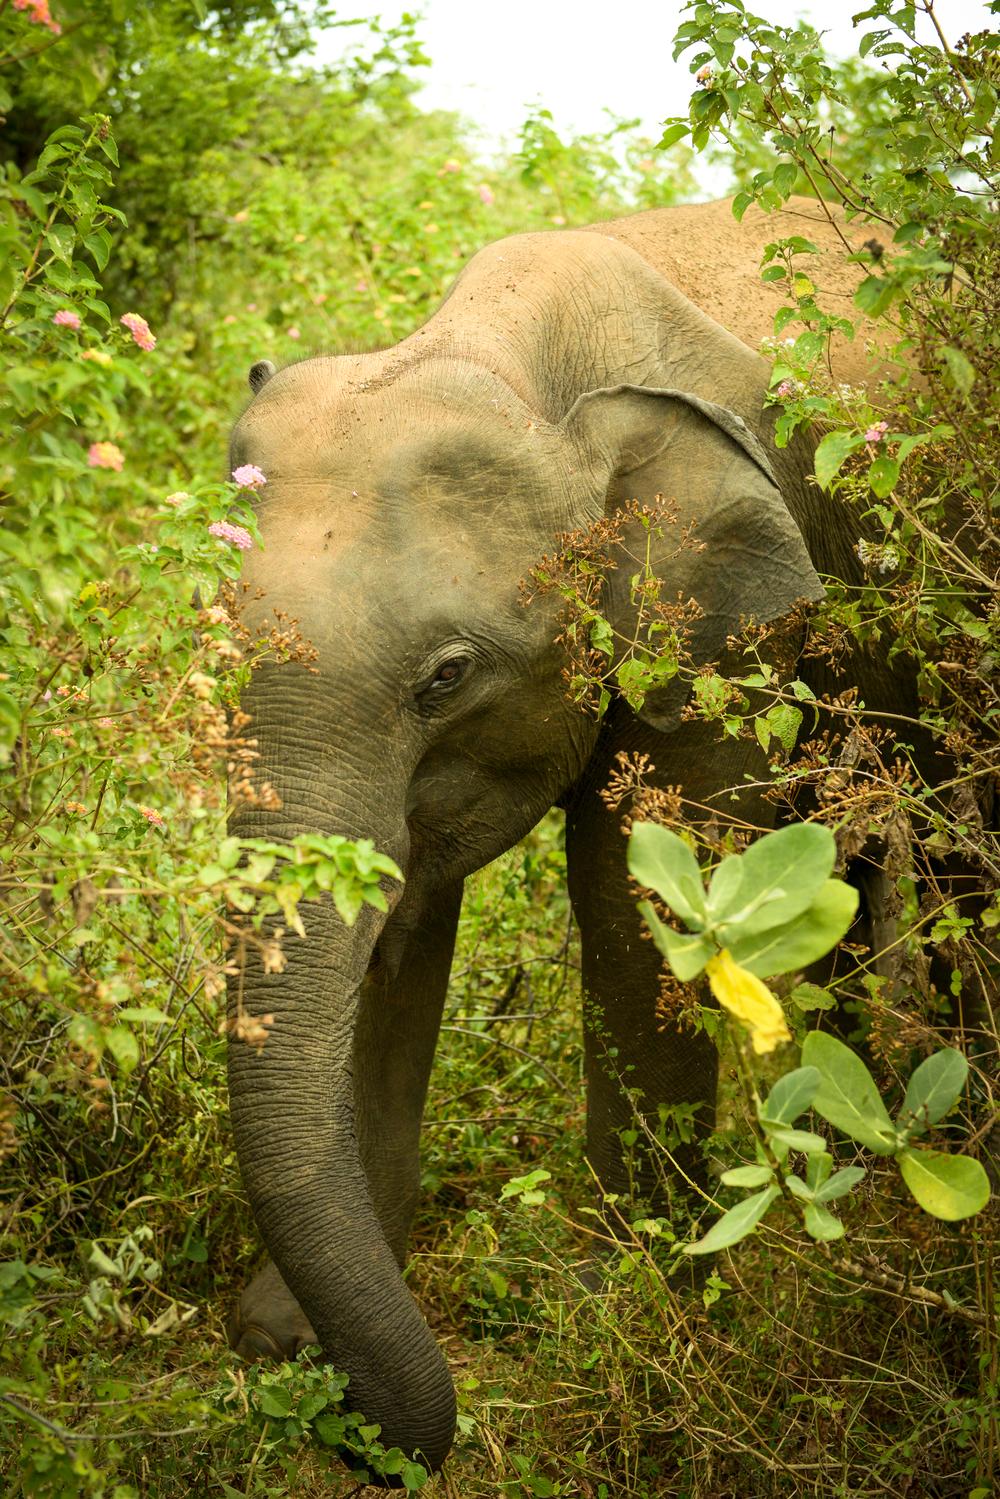 An elephant grazes in Unawatuna national park.